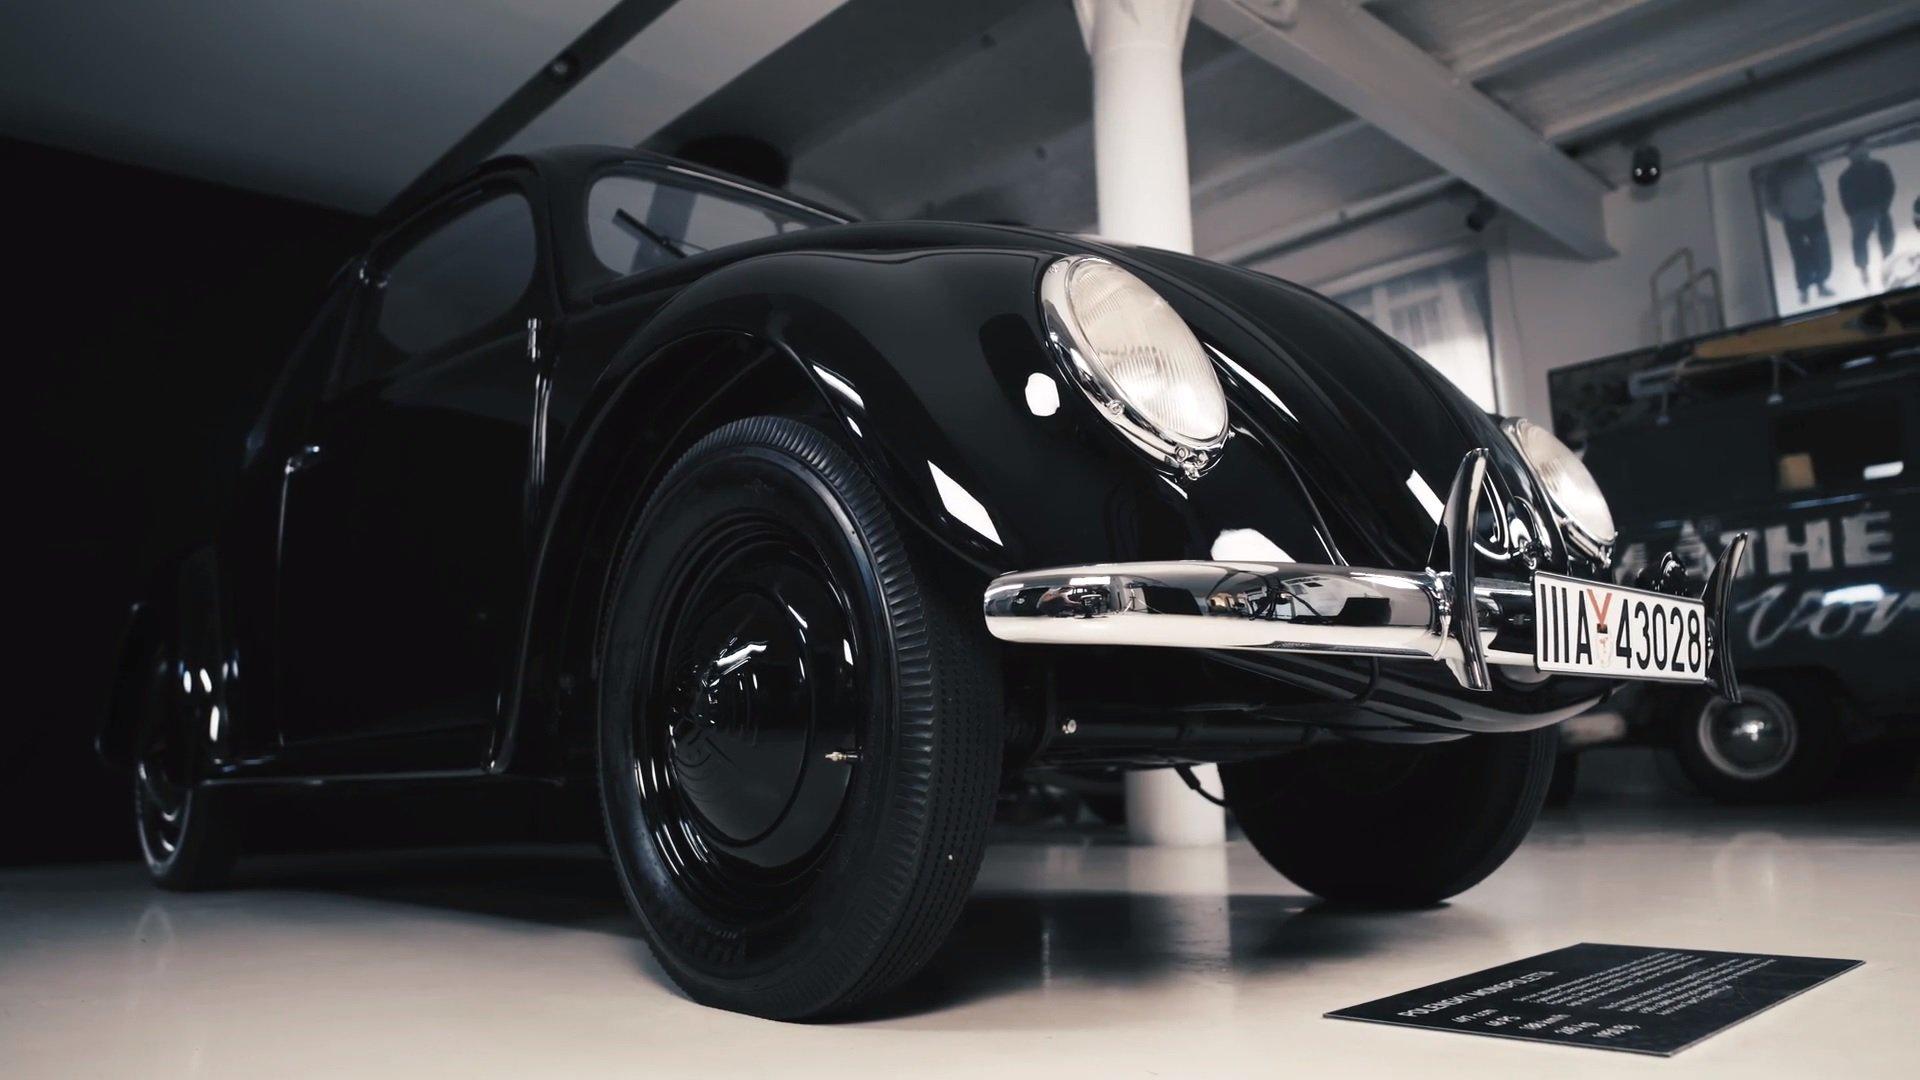 1_VW-39-2